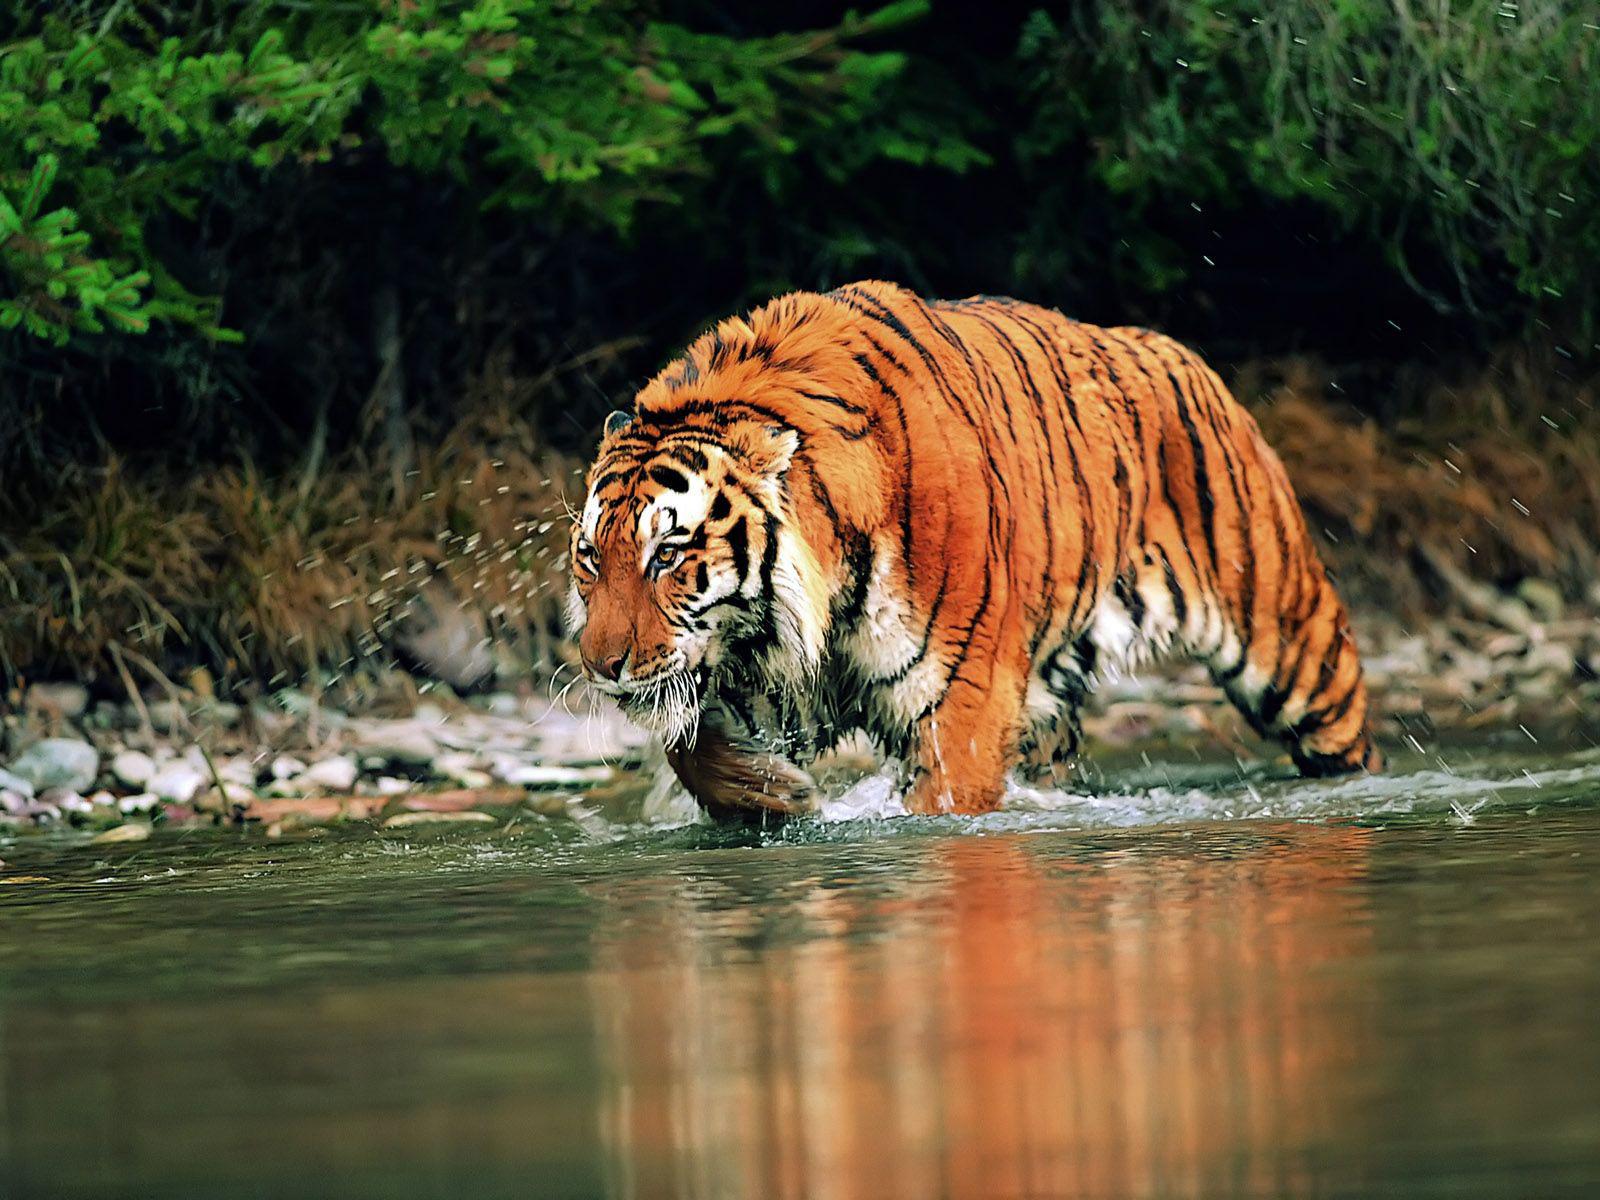 Wallpapers: Best Tiger Wallpapers